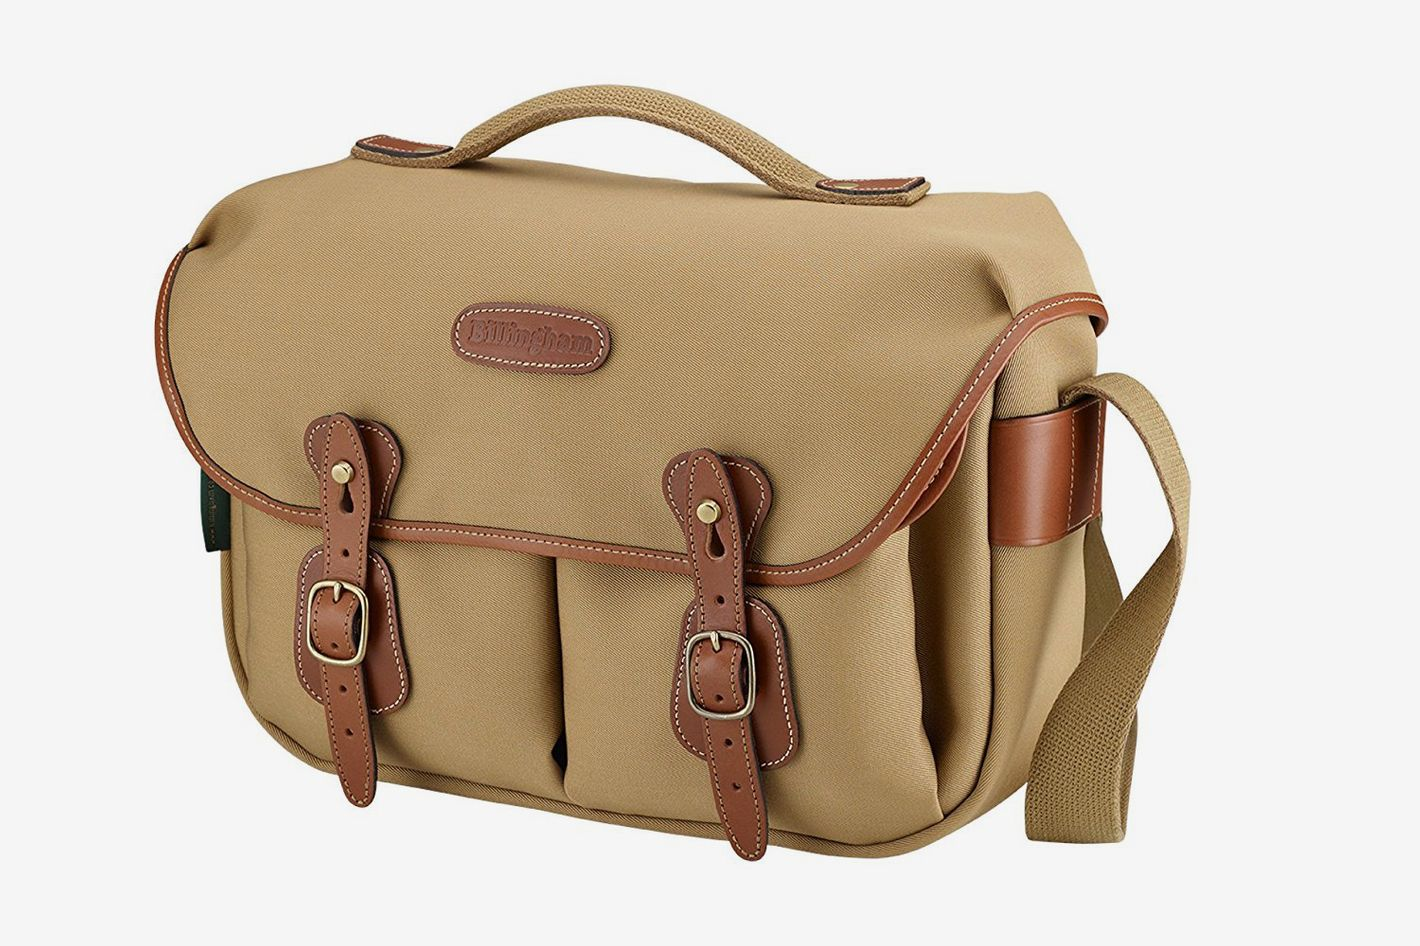 Billingham Hadley Pro Shoulder Bag (Khaki/Tan)